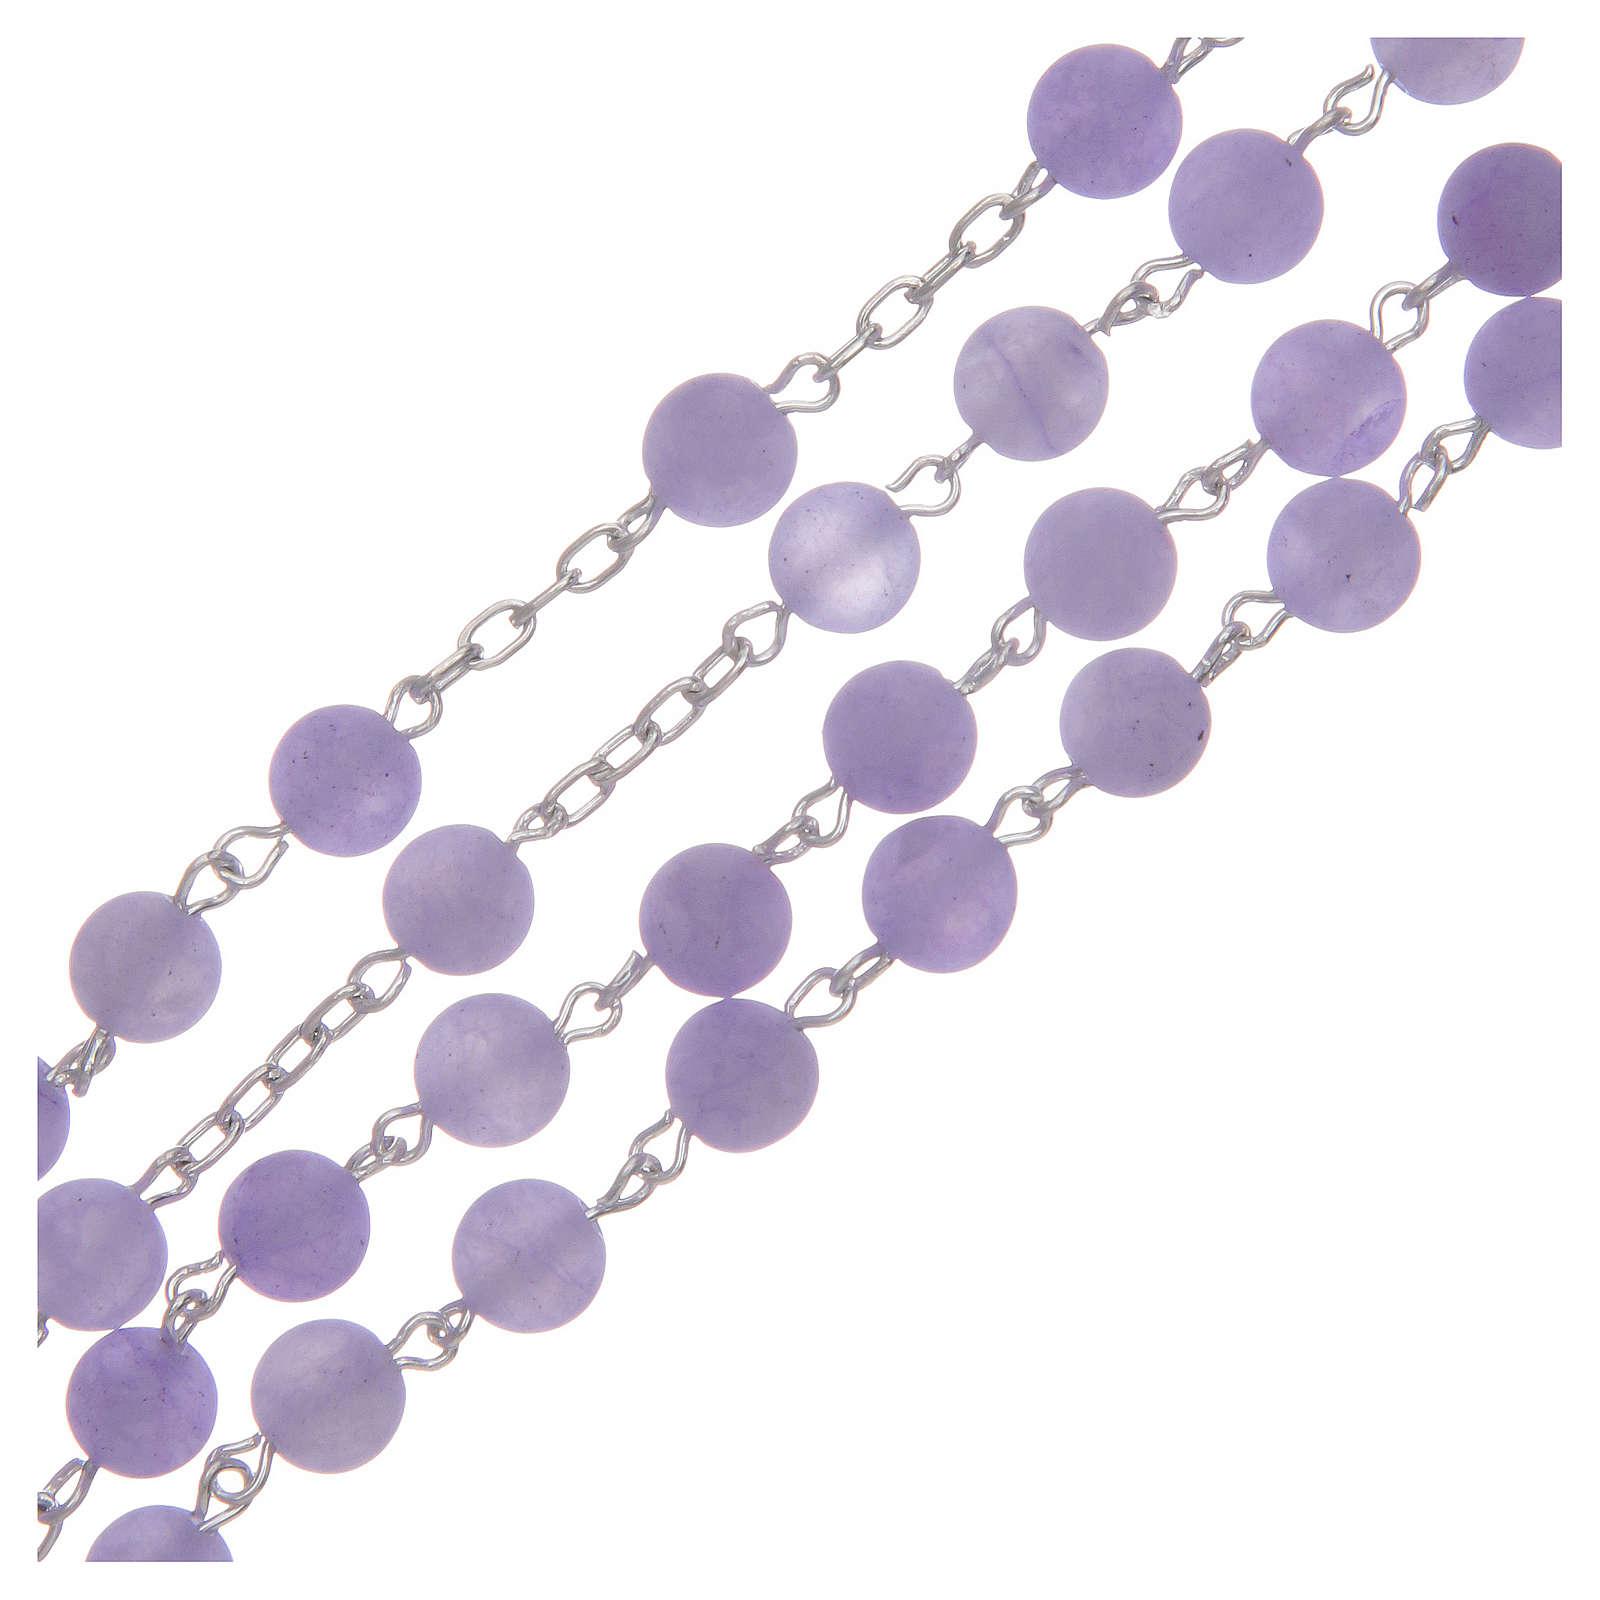 Rosario argento 925 e agata satinata 6 mm viola 4